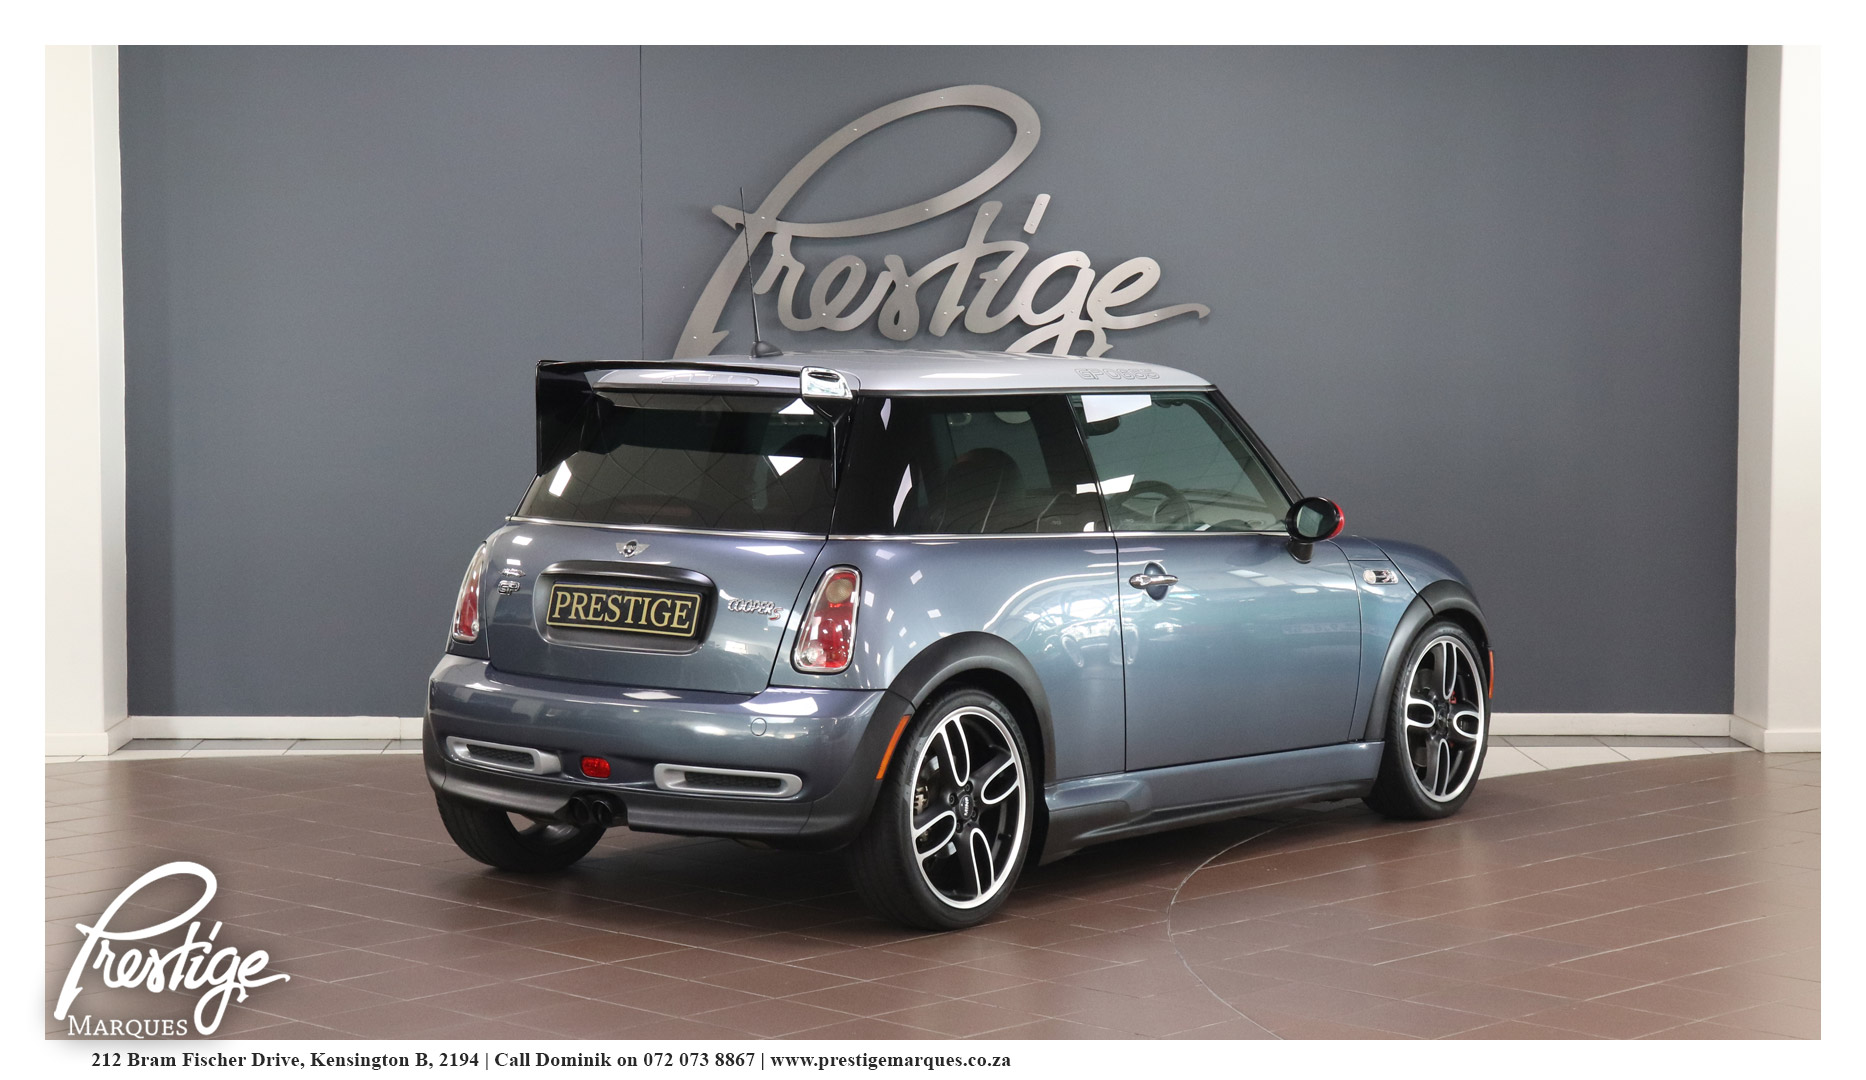 2006-Mini-Cooper-S-GP-Johon-Cooper-Works- Prestige-Marques-Randburg-Sandton-4